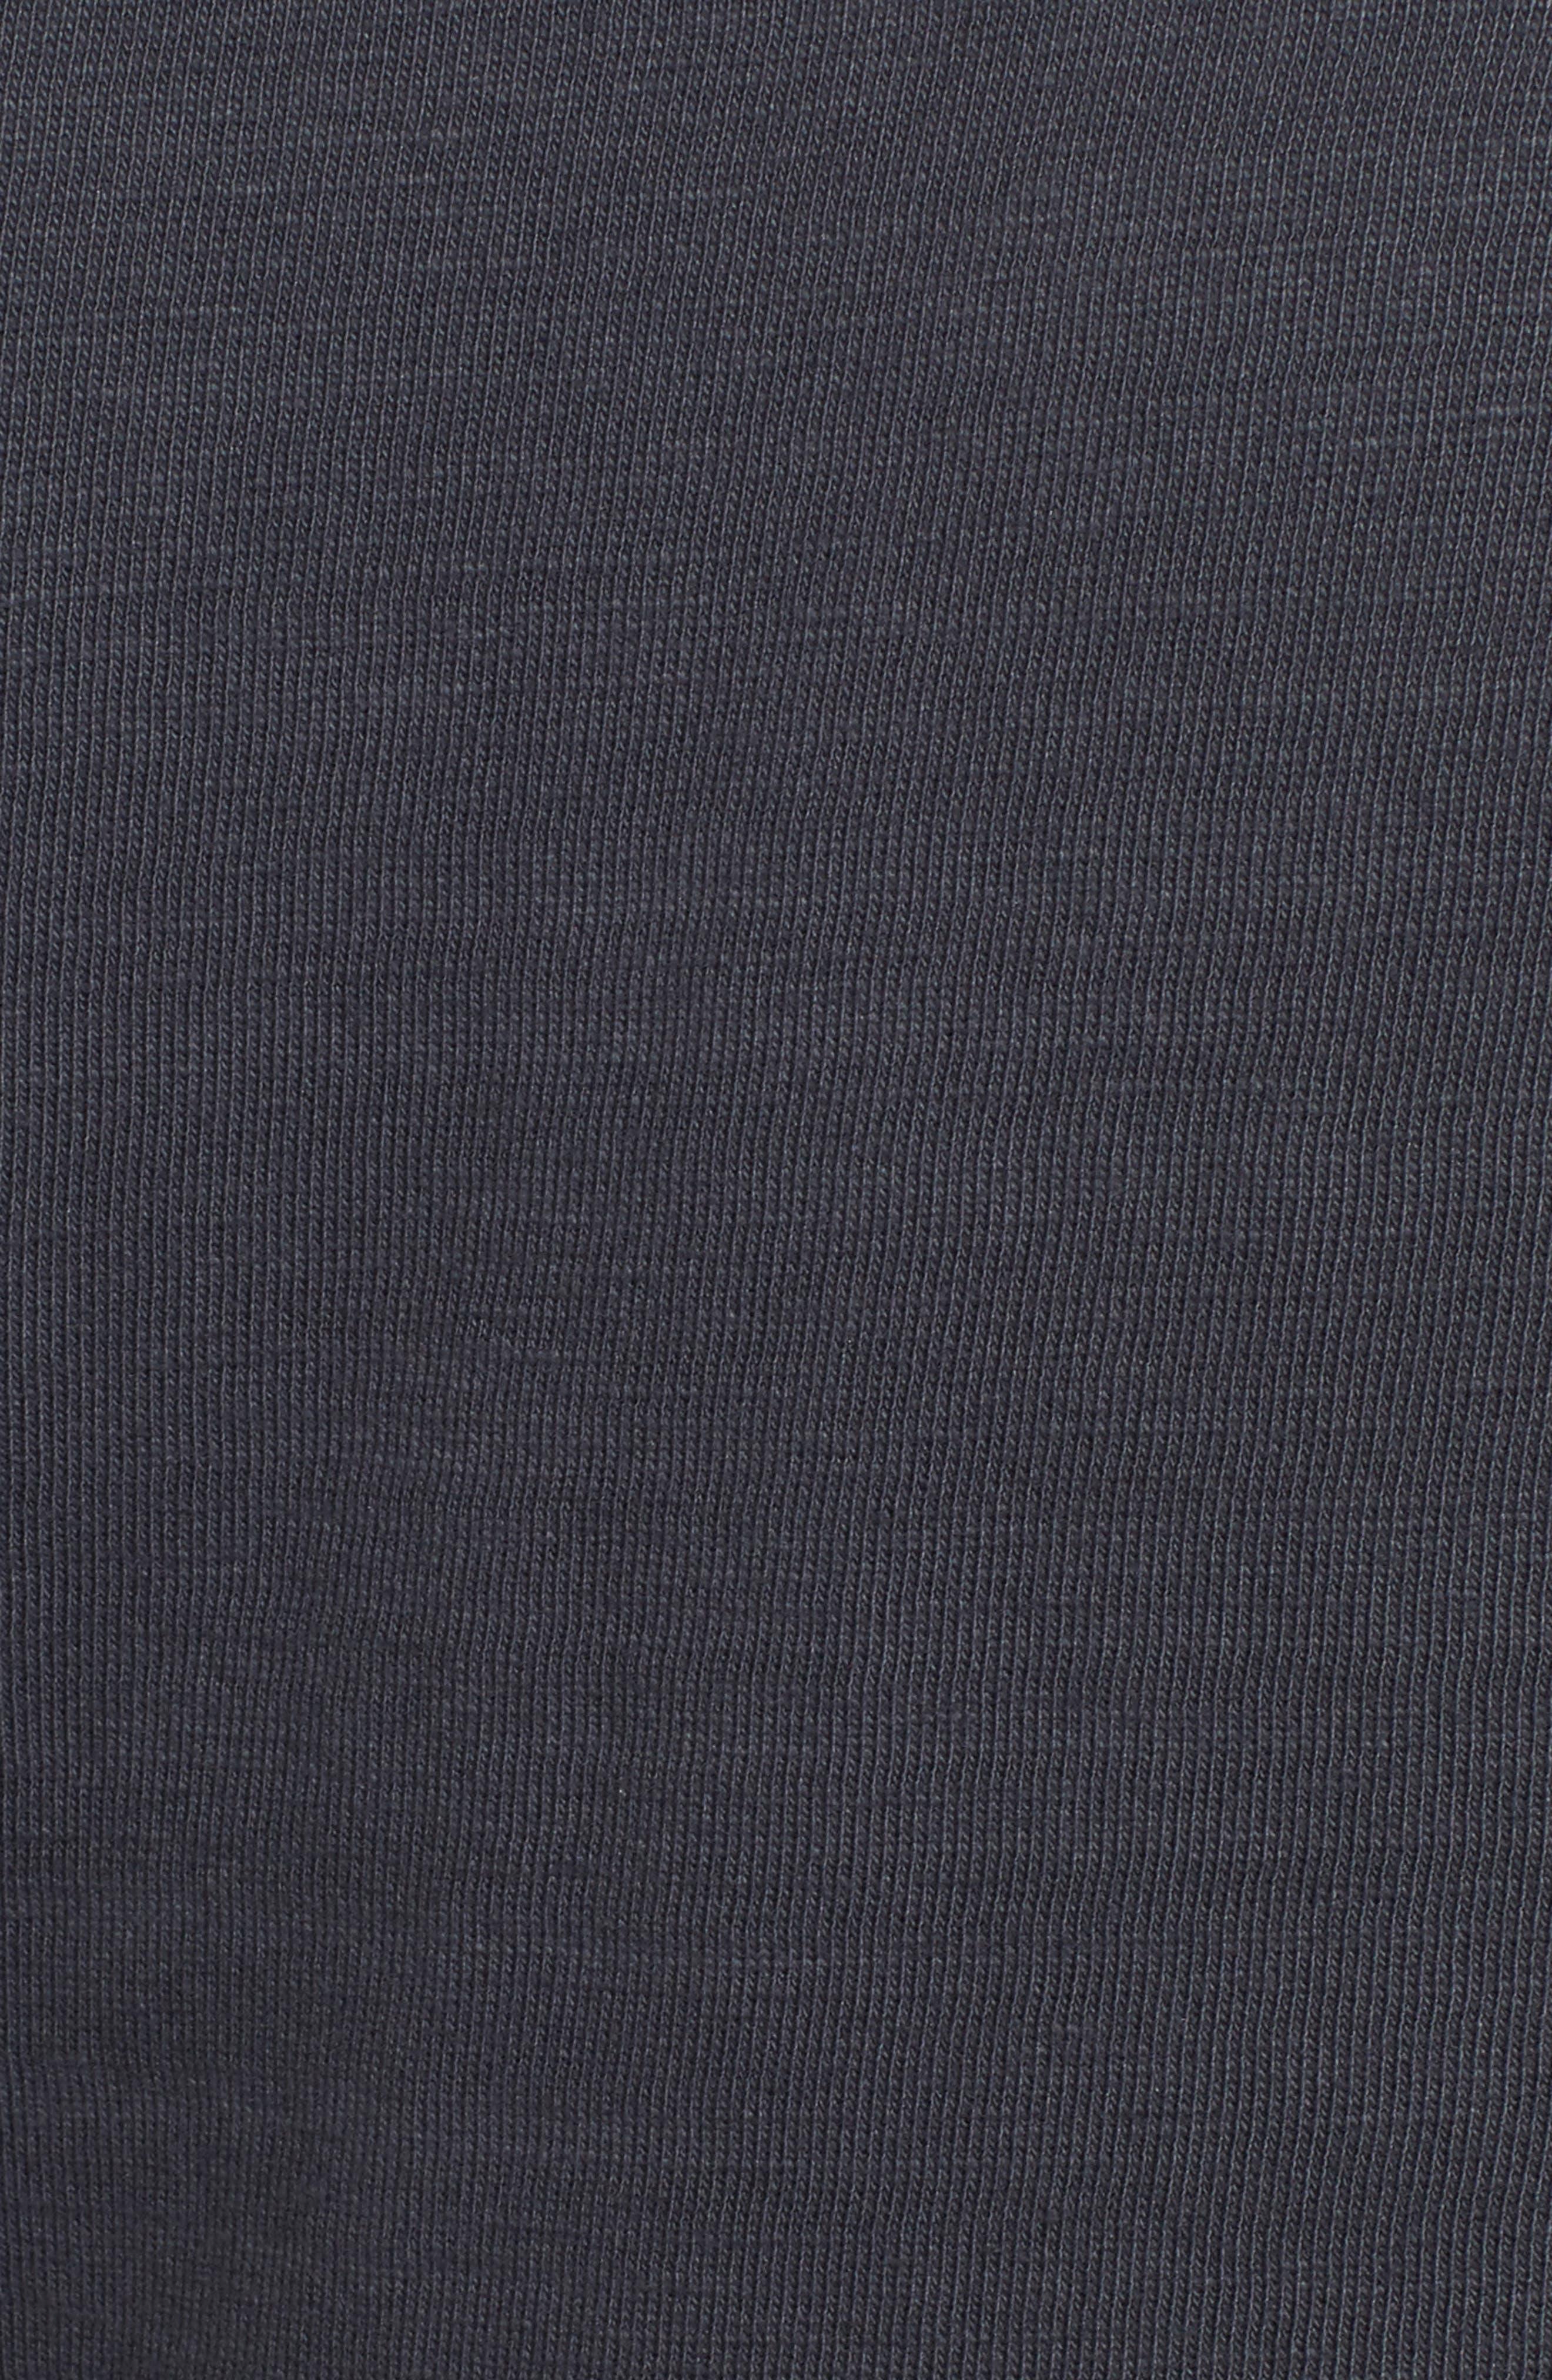 Knit One-Button Blazer,                             Alternate thumbnail 102, color,